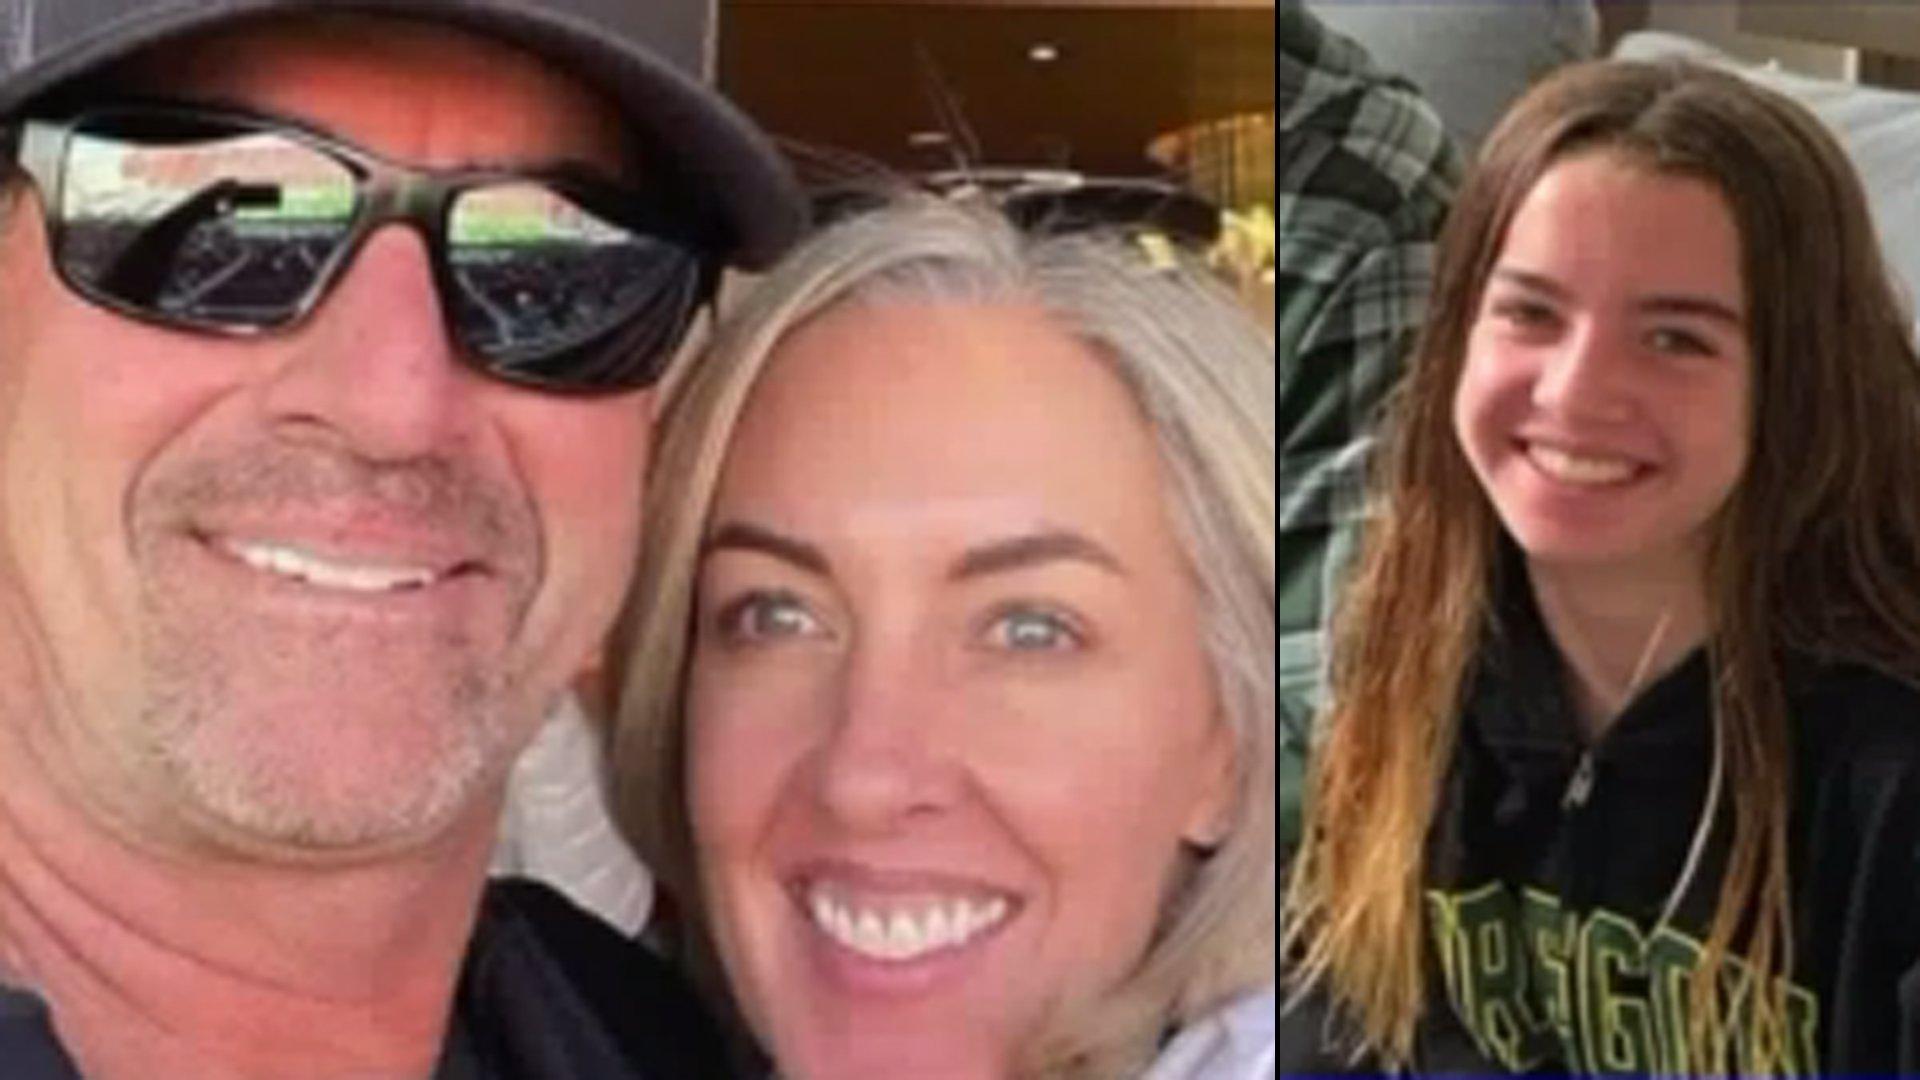 John, Kerri and Alyssa Altobelli (left to right) are seen in images posted to Keri Altobelli's Facebook page.